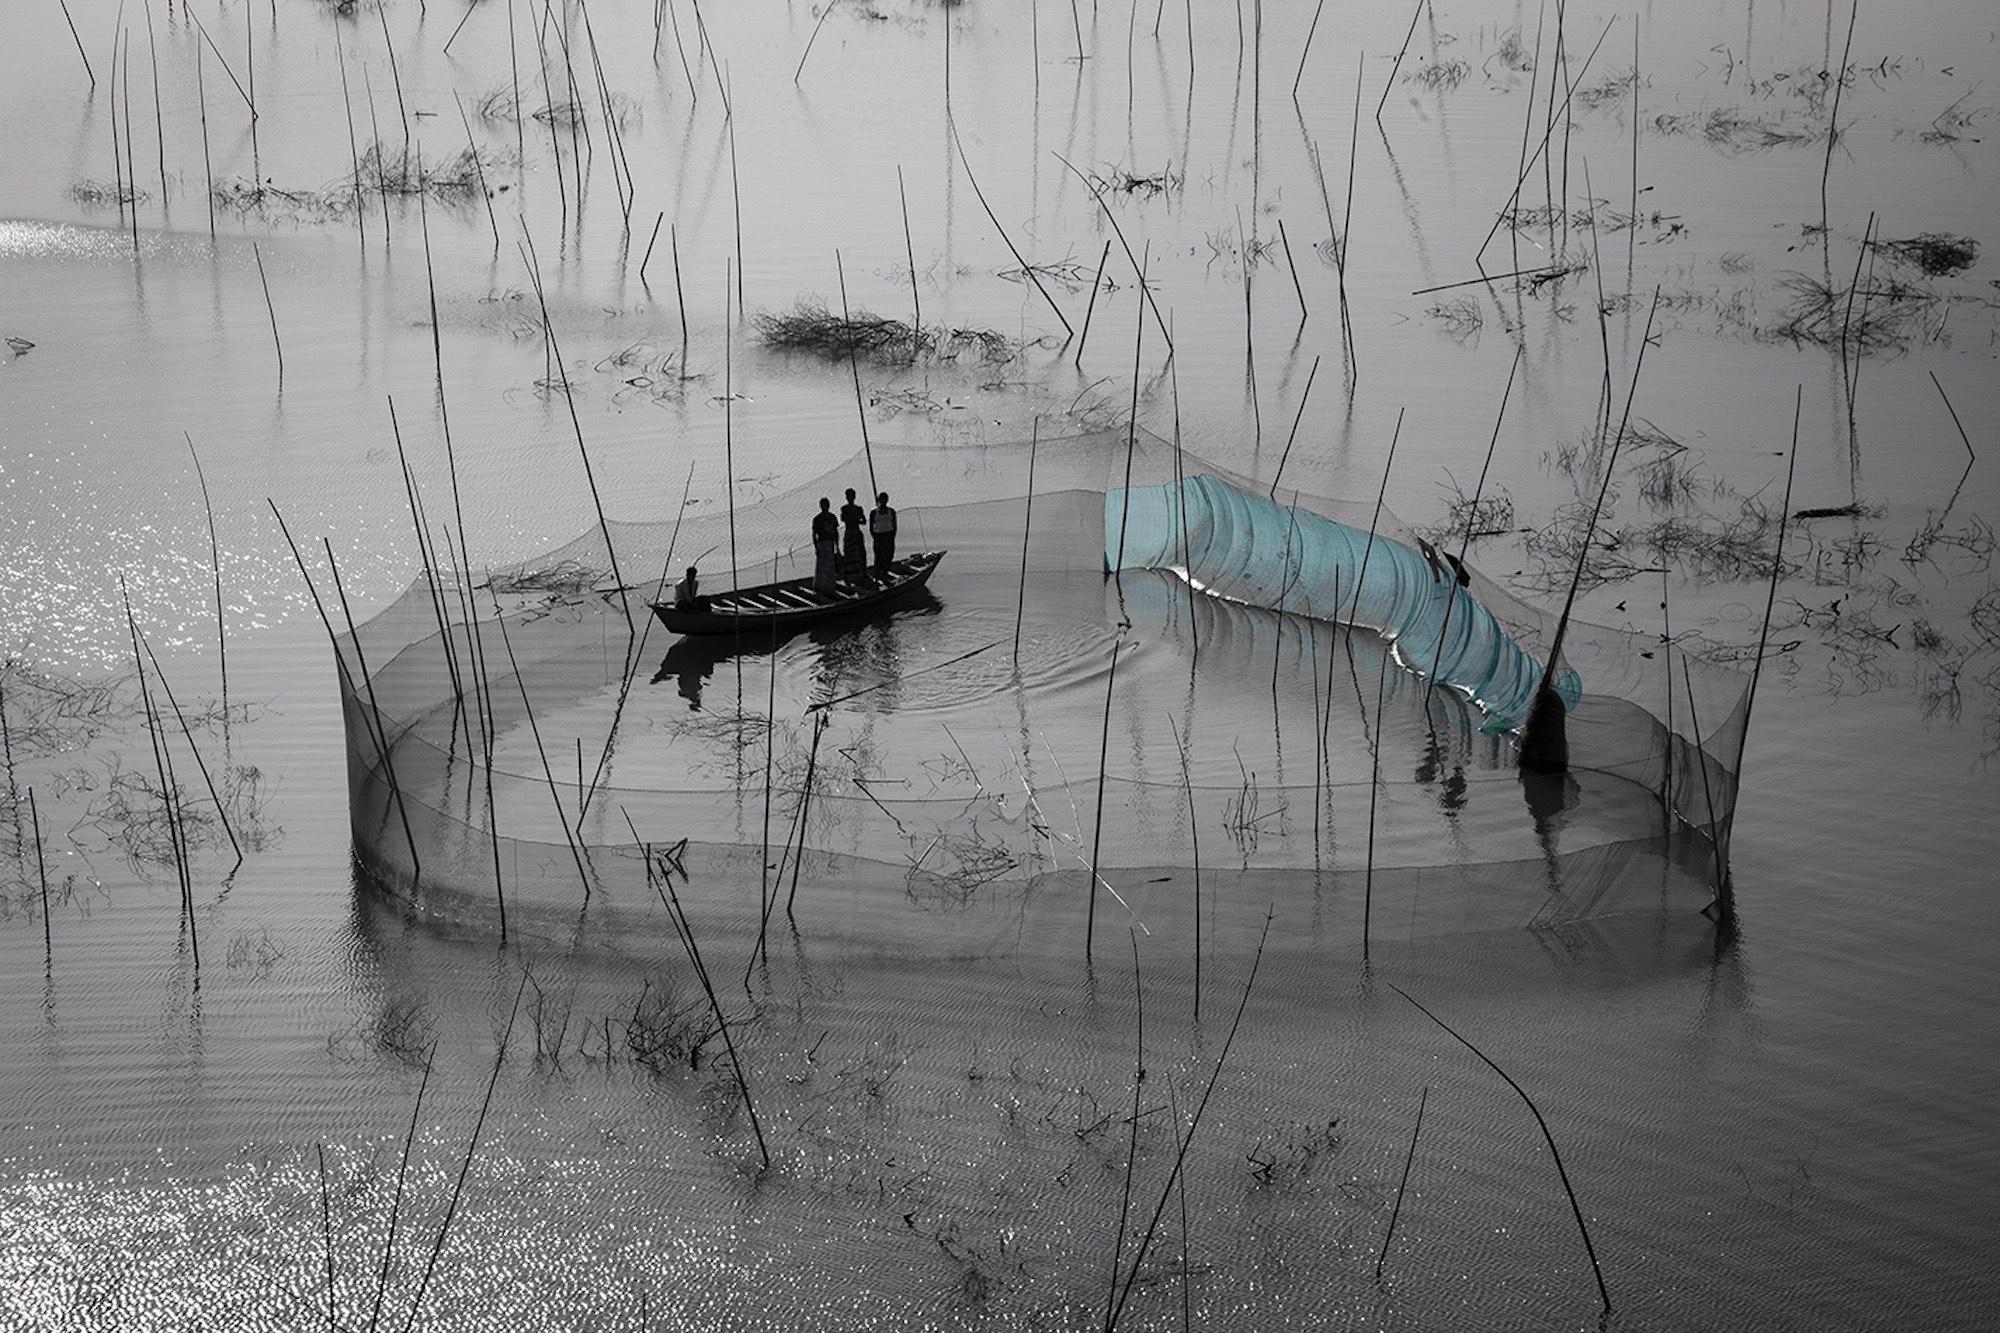 Fishing nets - Yann Arthus-Bertrand